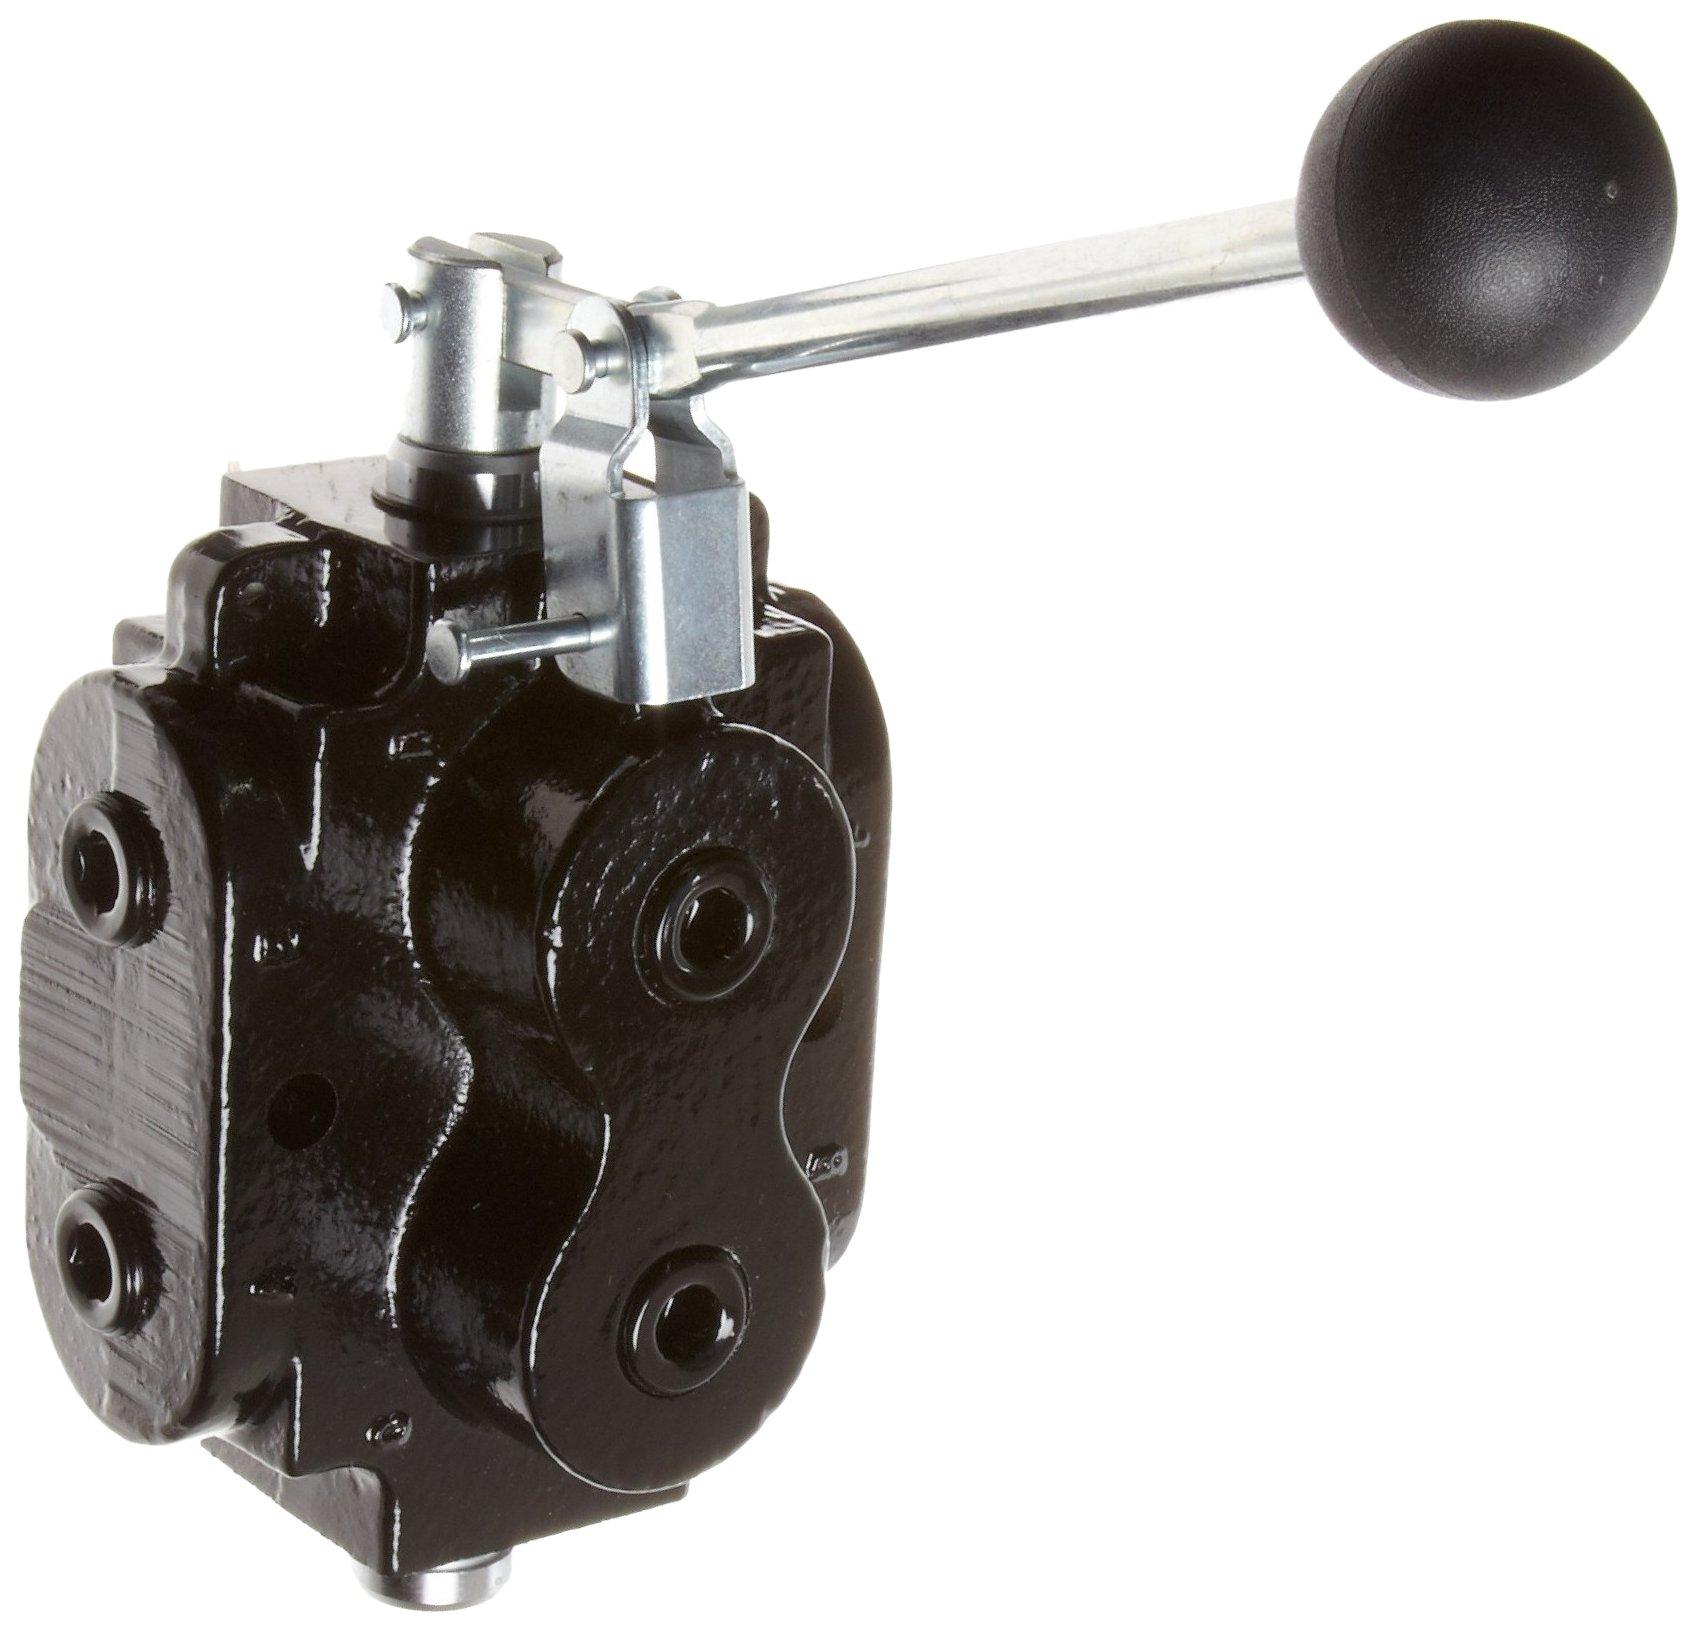 Prince DS-1A1E Directional Control Valve, Monoblock, Cast Iron, 1 Spool, 6 Ways, 2 Positions, Lever Handle, 2500 psi, 40 gpm, 1/2 NPT Female